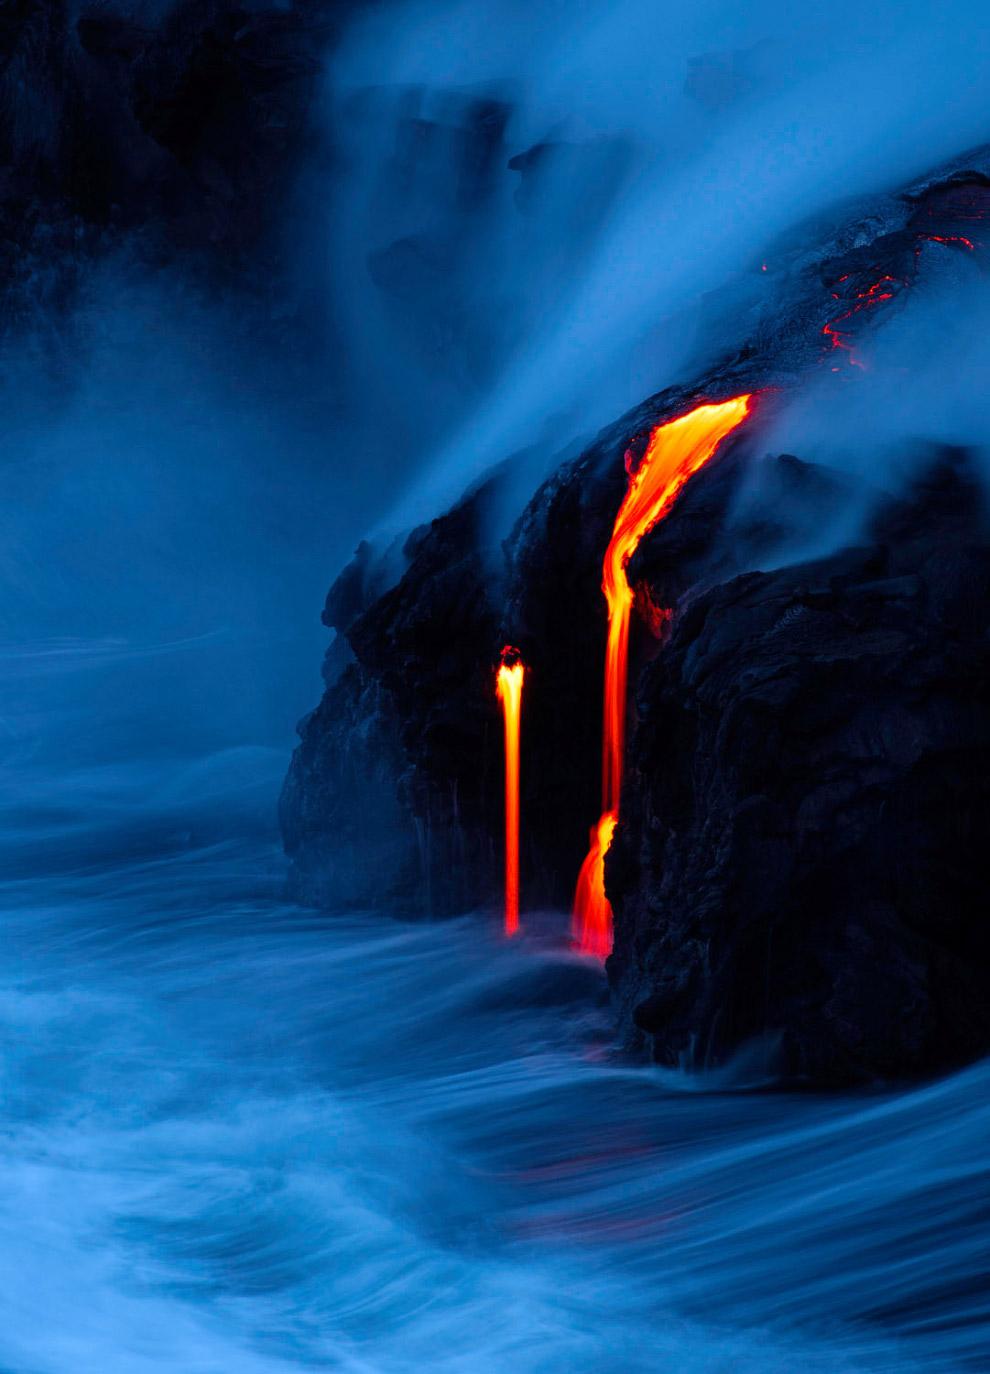 Лава з вулкана Кілауеа впадає в океан в Капалане, Гаваї